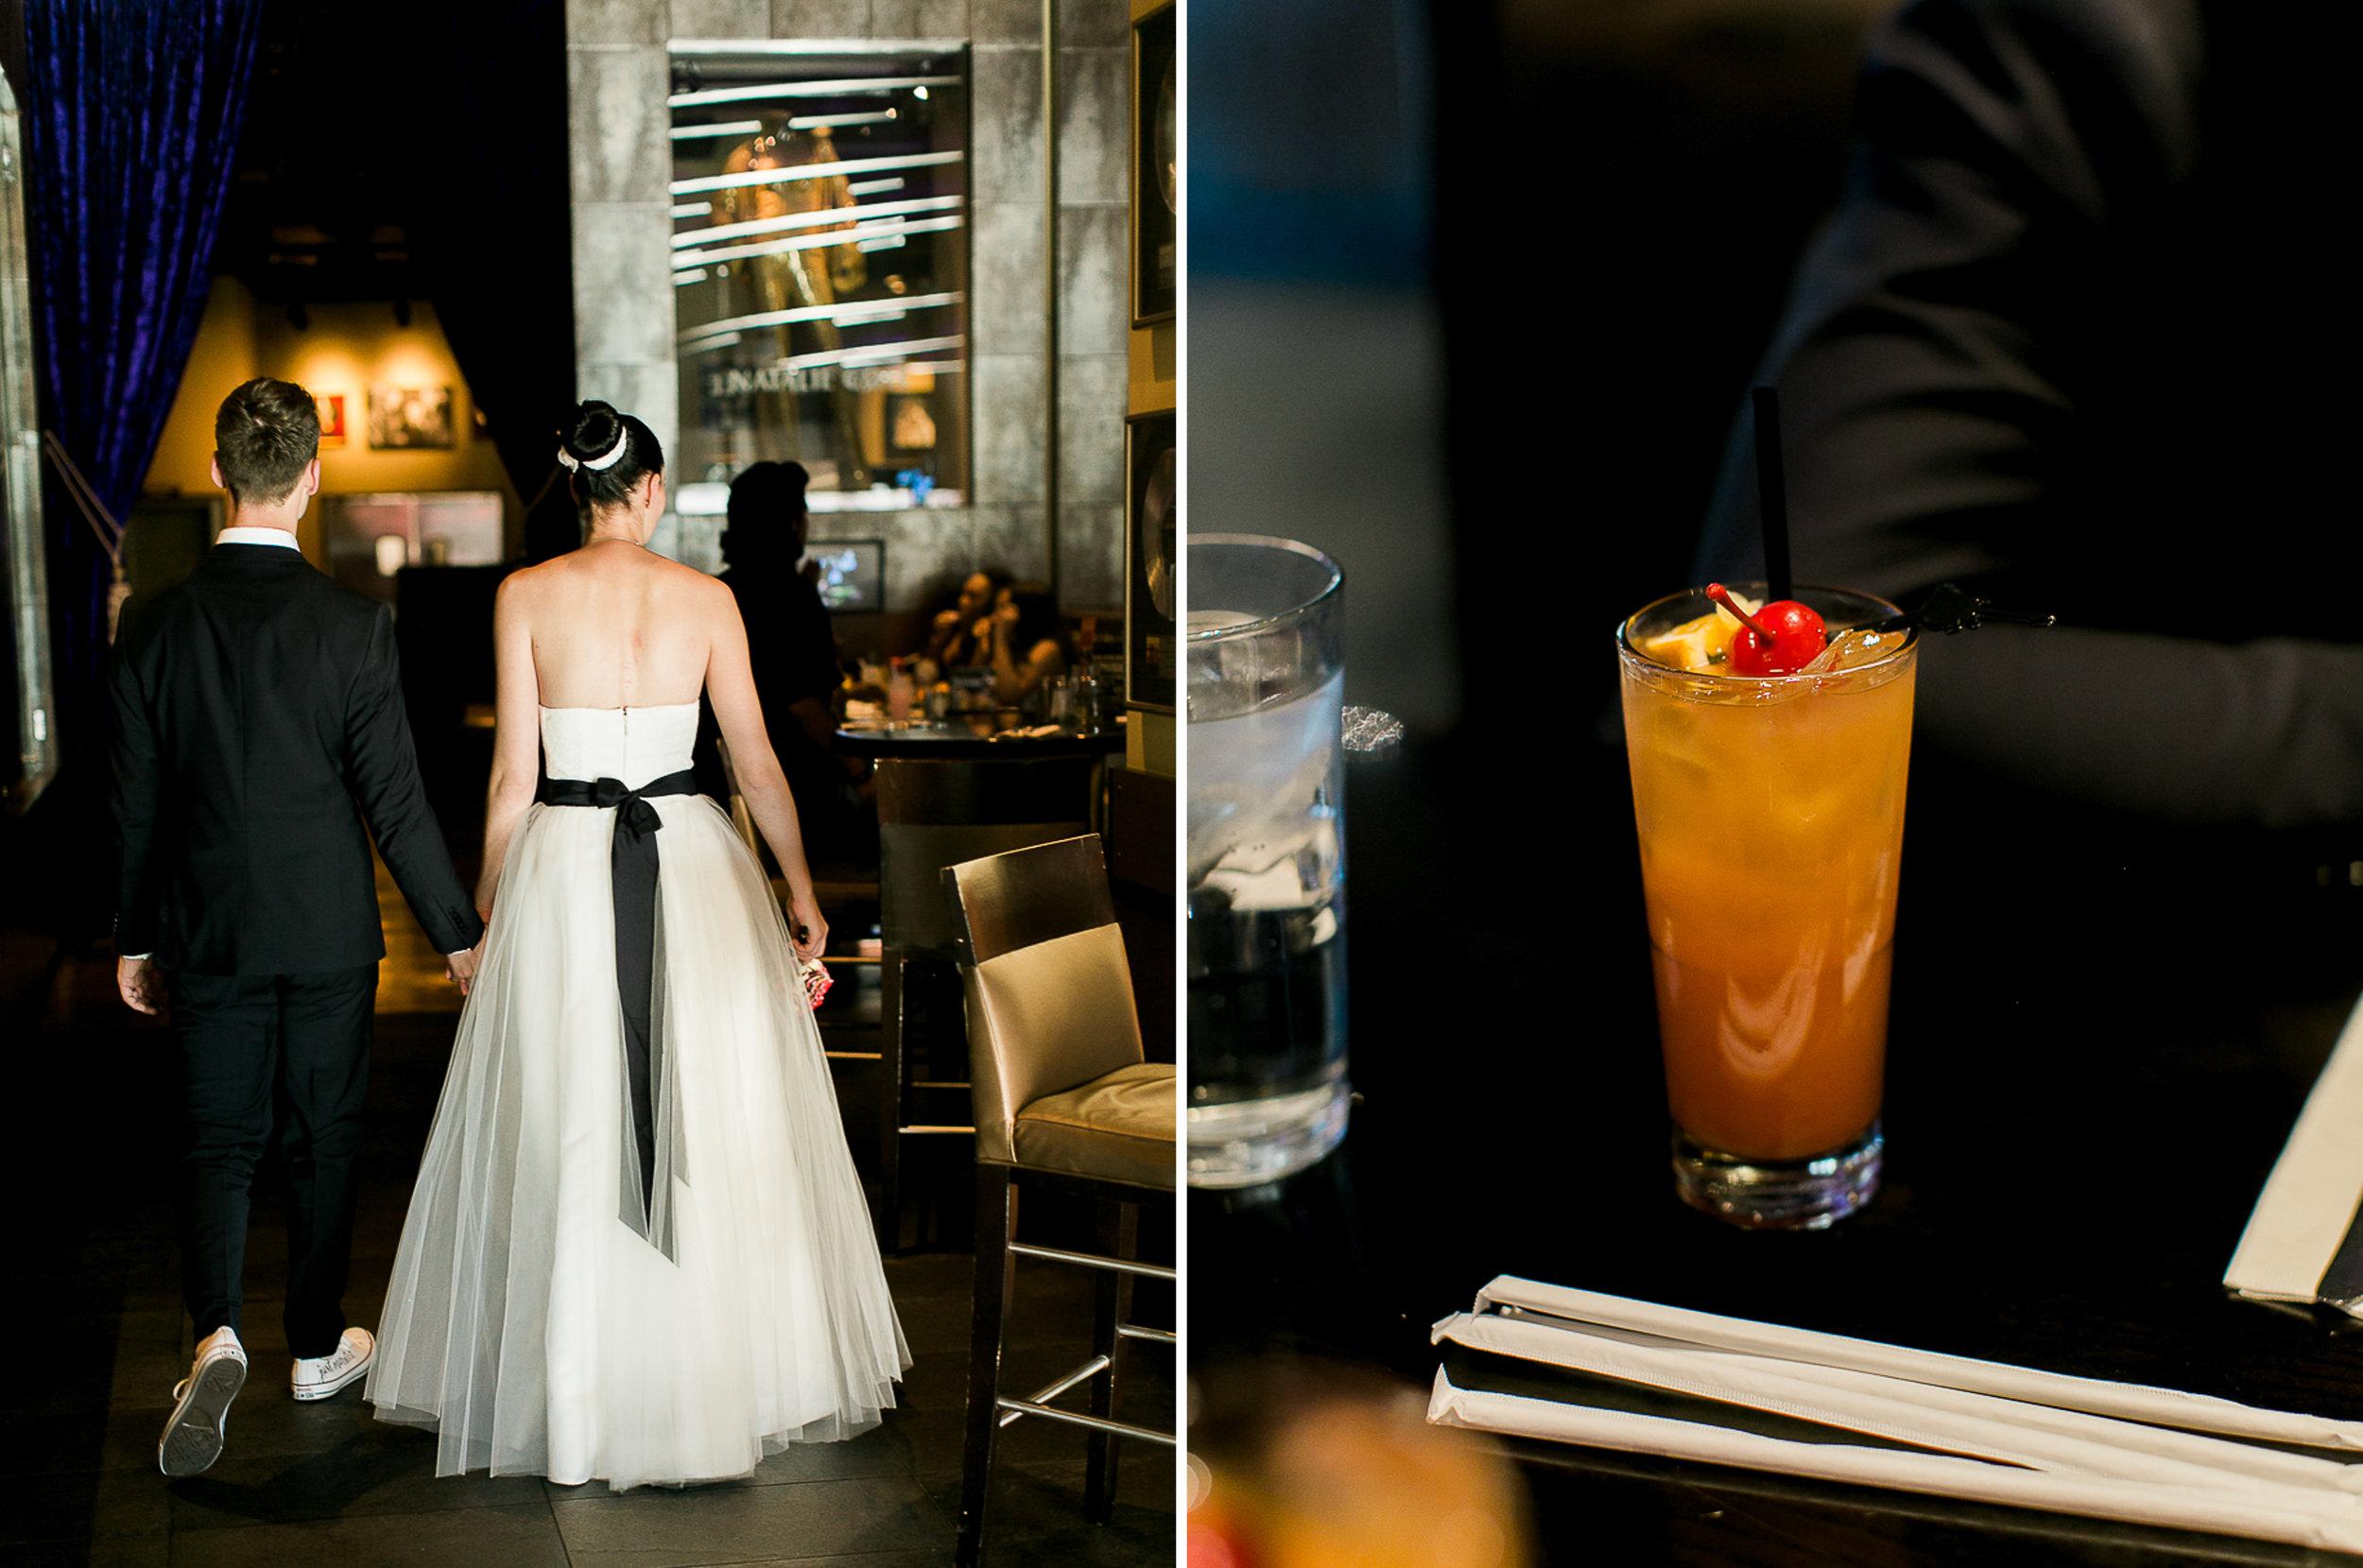 Susi-und-Danu-Hochzeit-Theresa-Pewal-Fotografie-fine-art-5-04.jpg